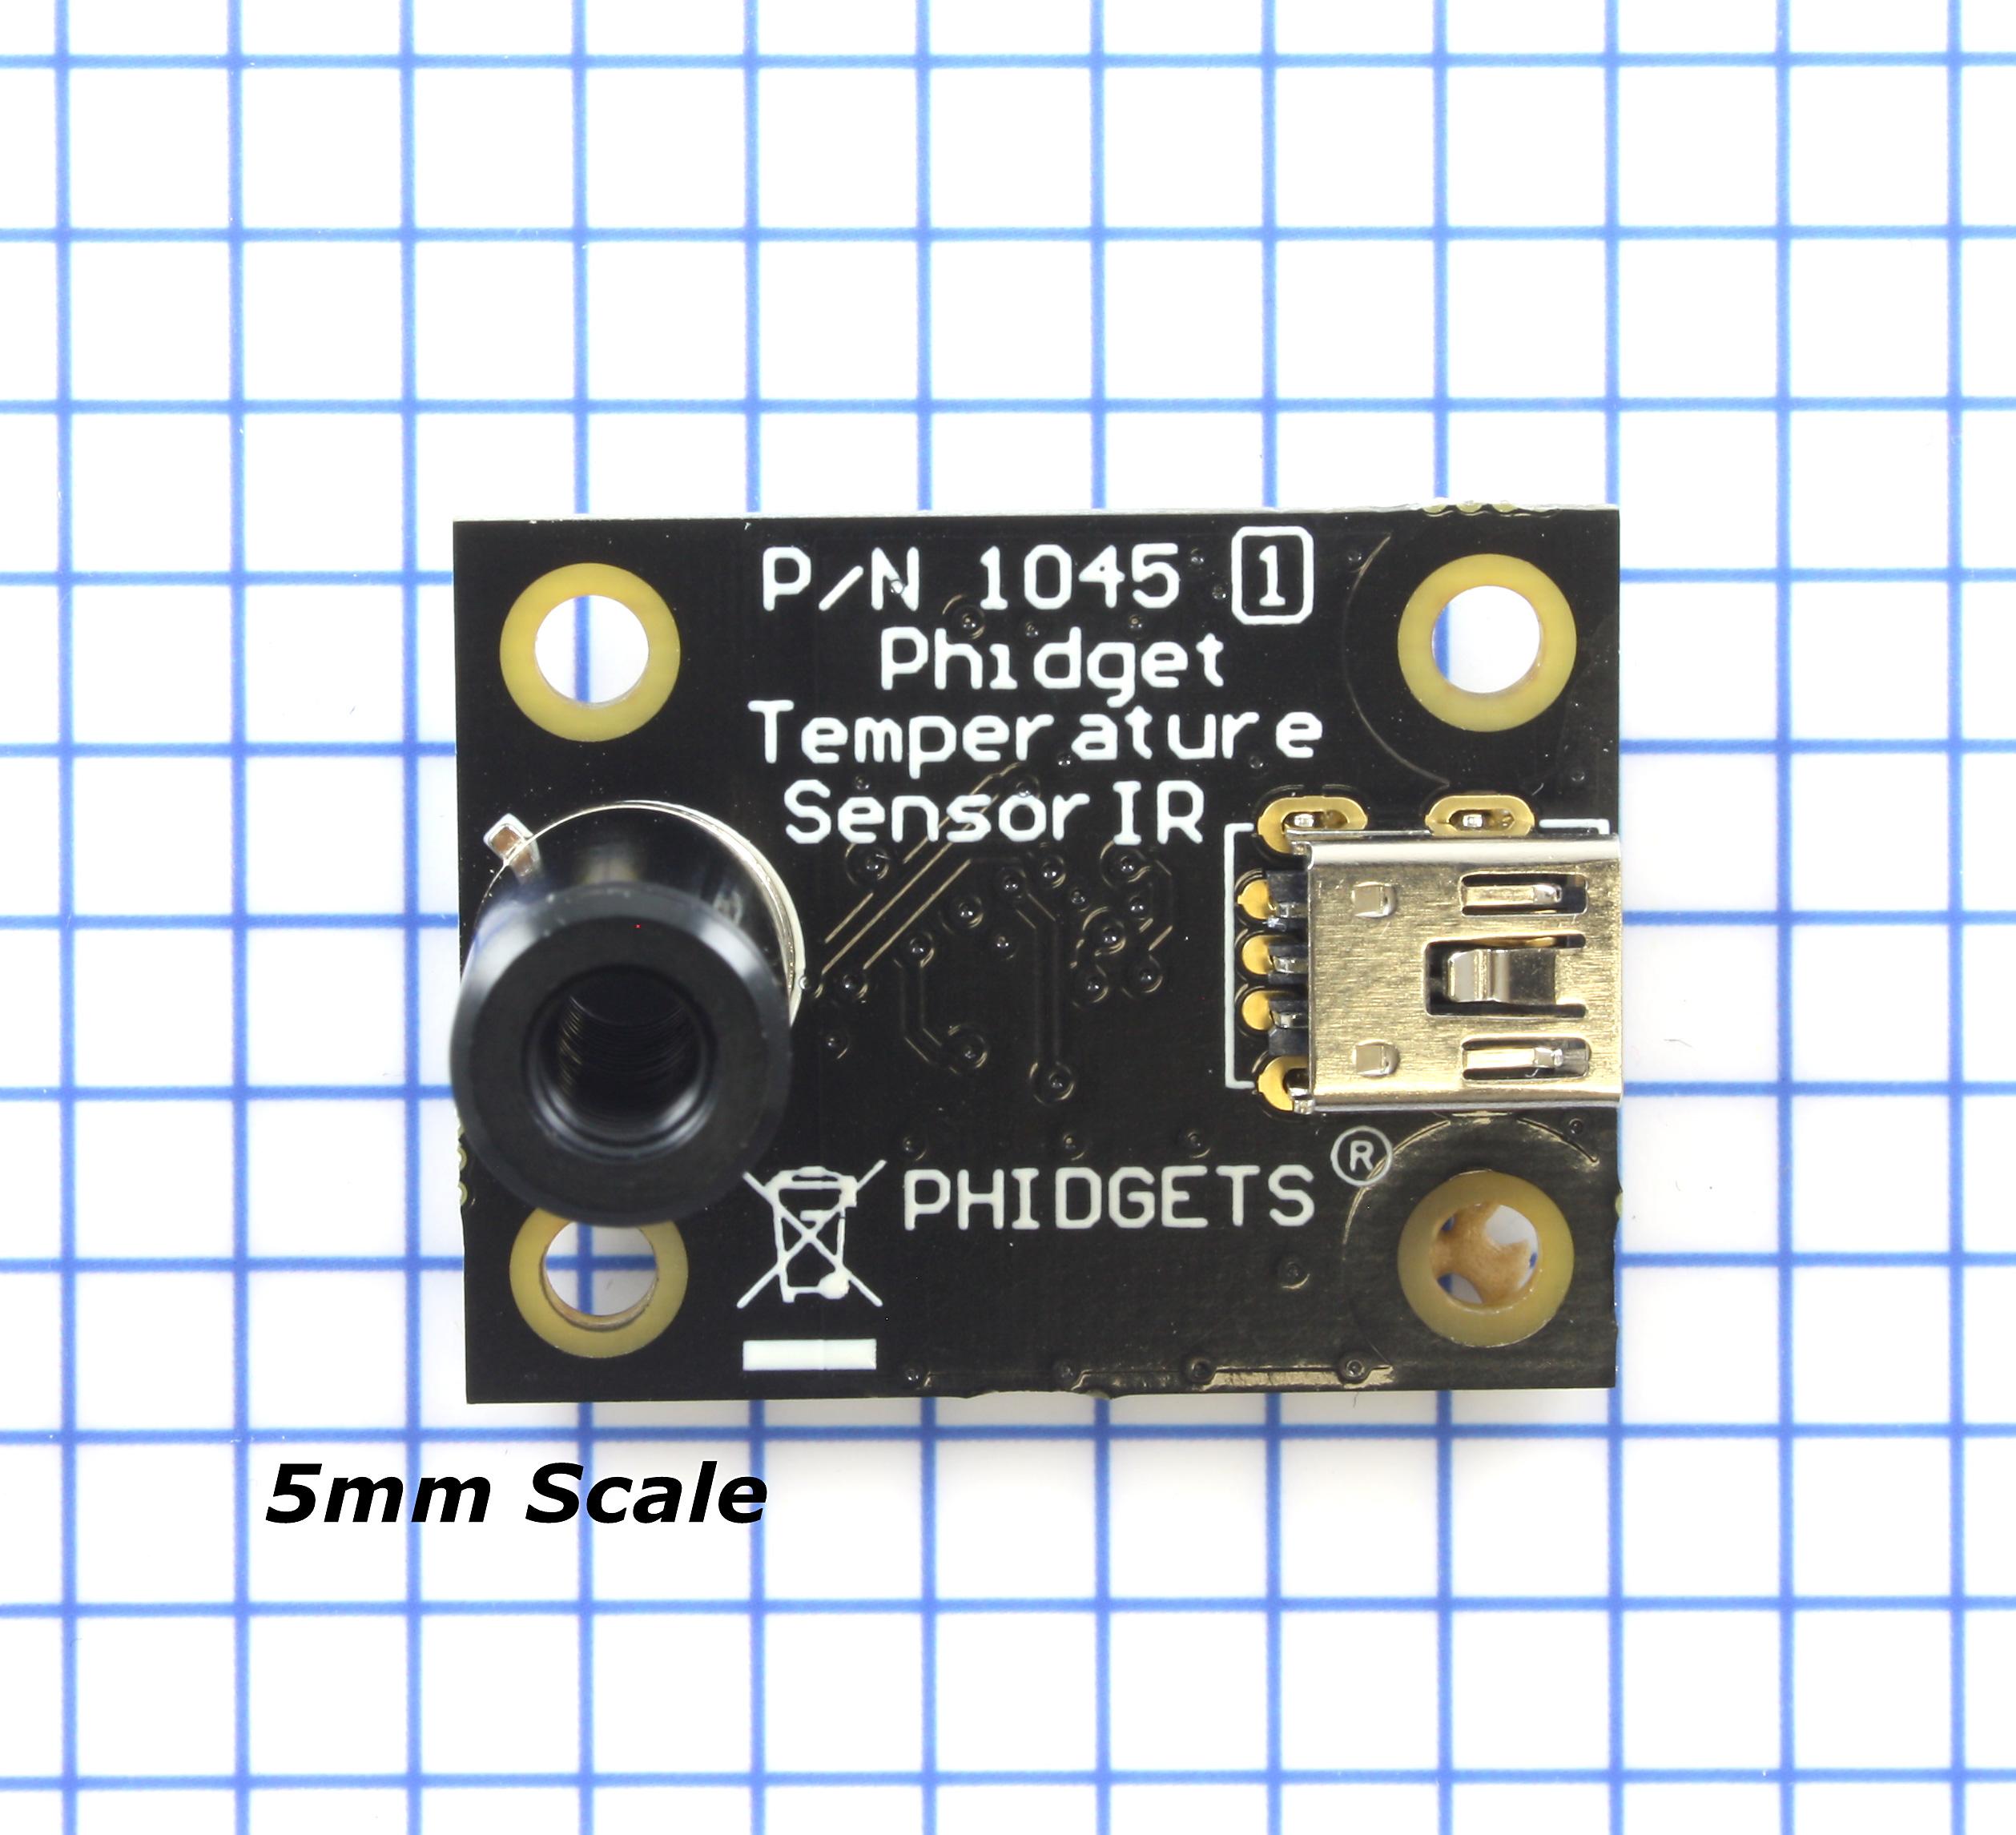 Phidget 1045/_1 TemperatureSensor IR